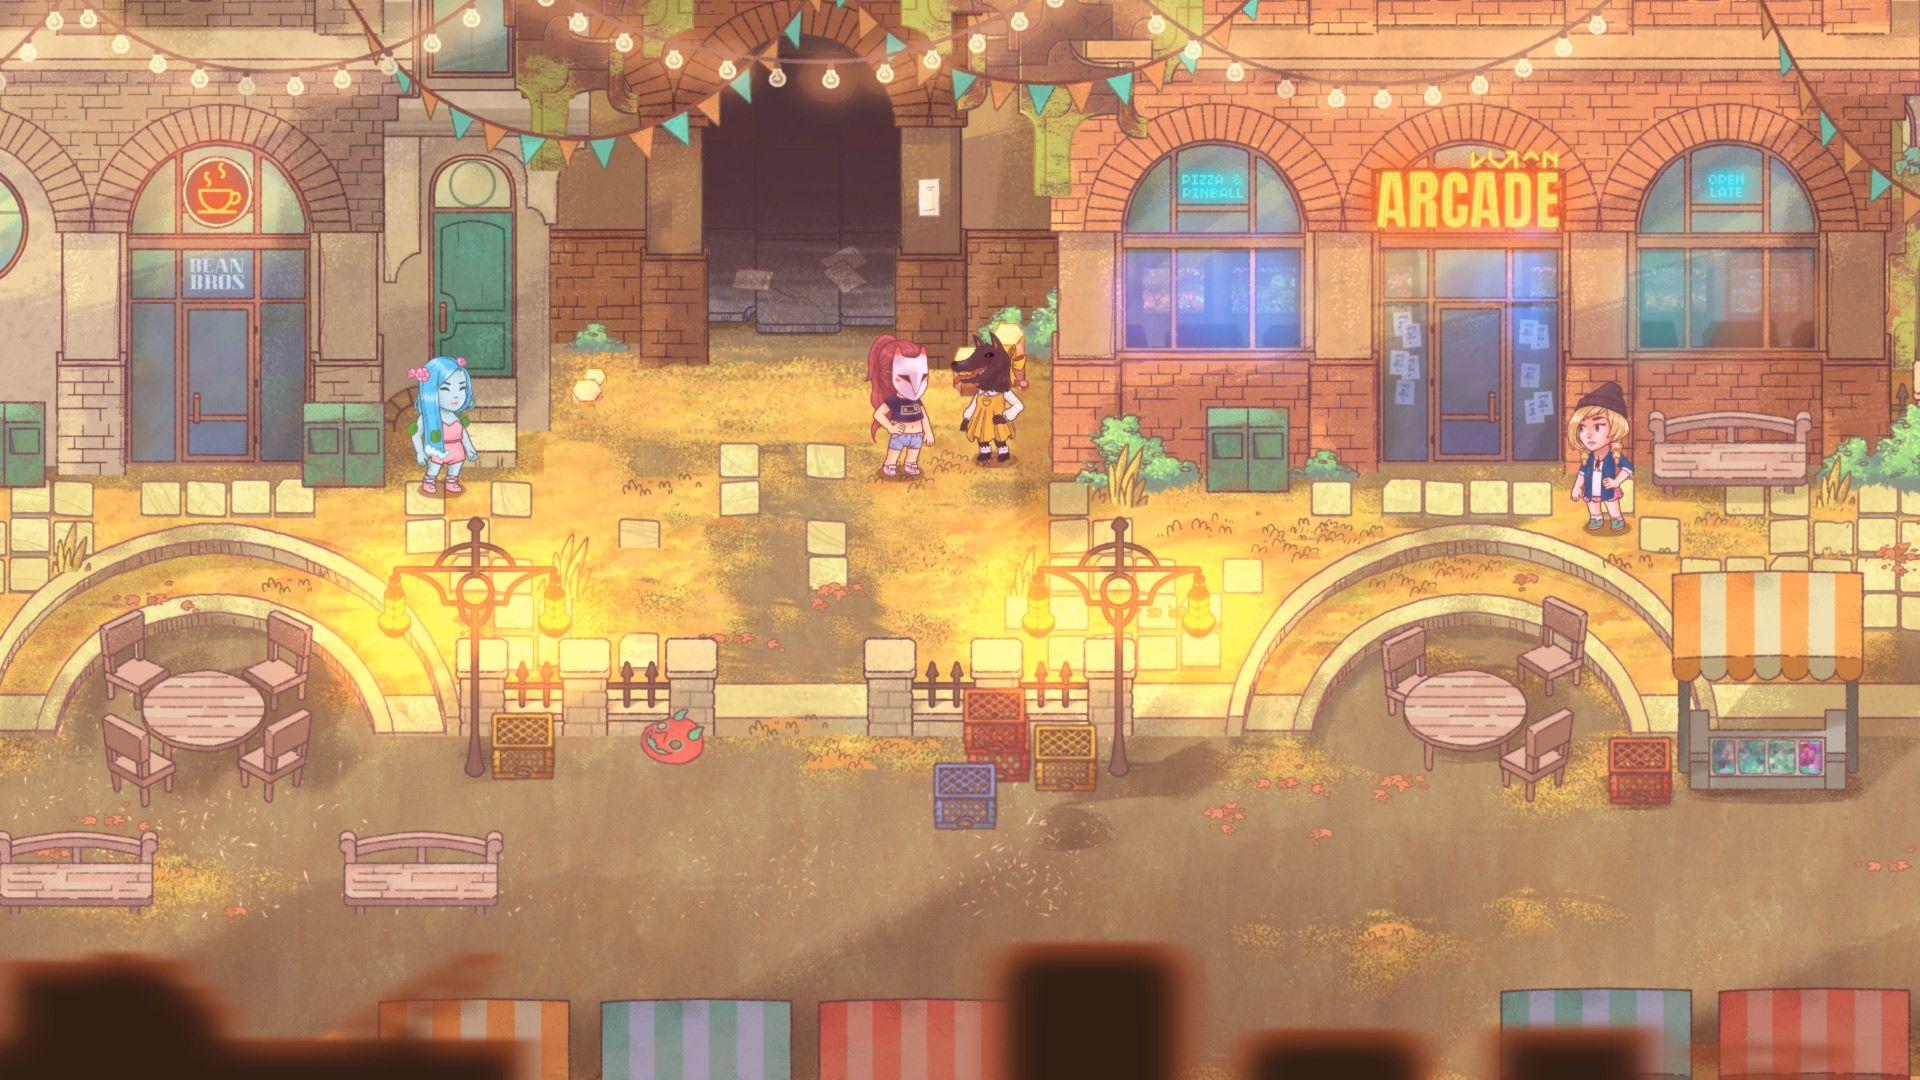 Pin by Niche Gamer on Niche Gamer Games, Video game news